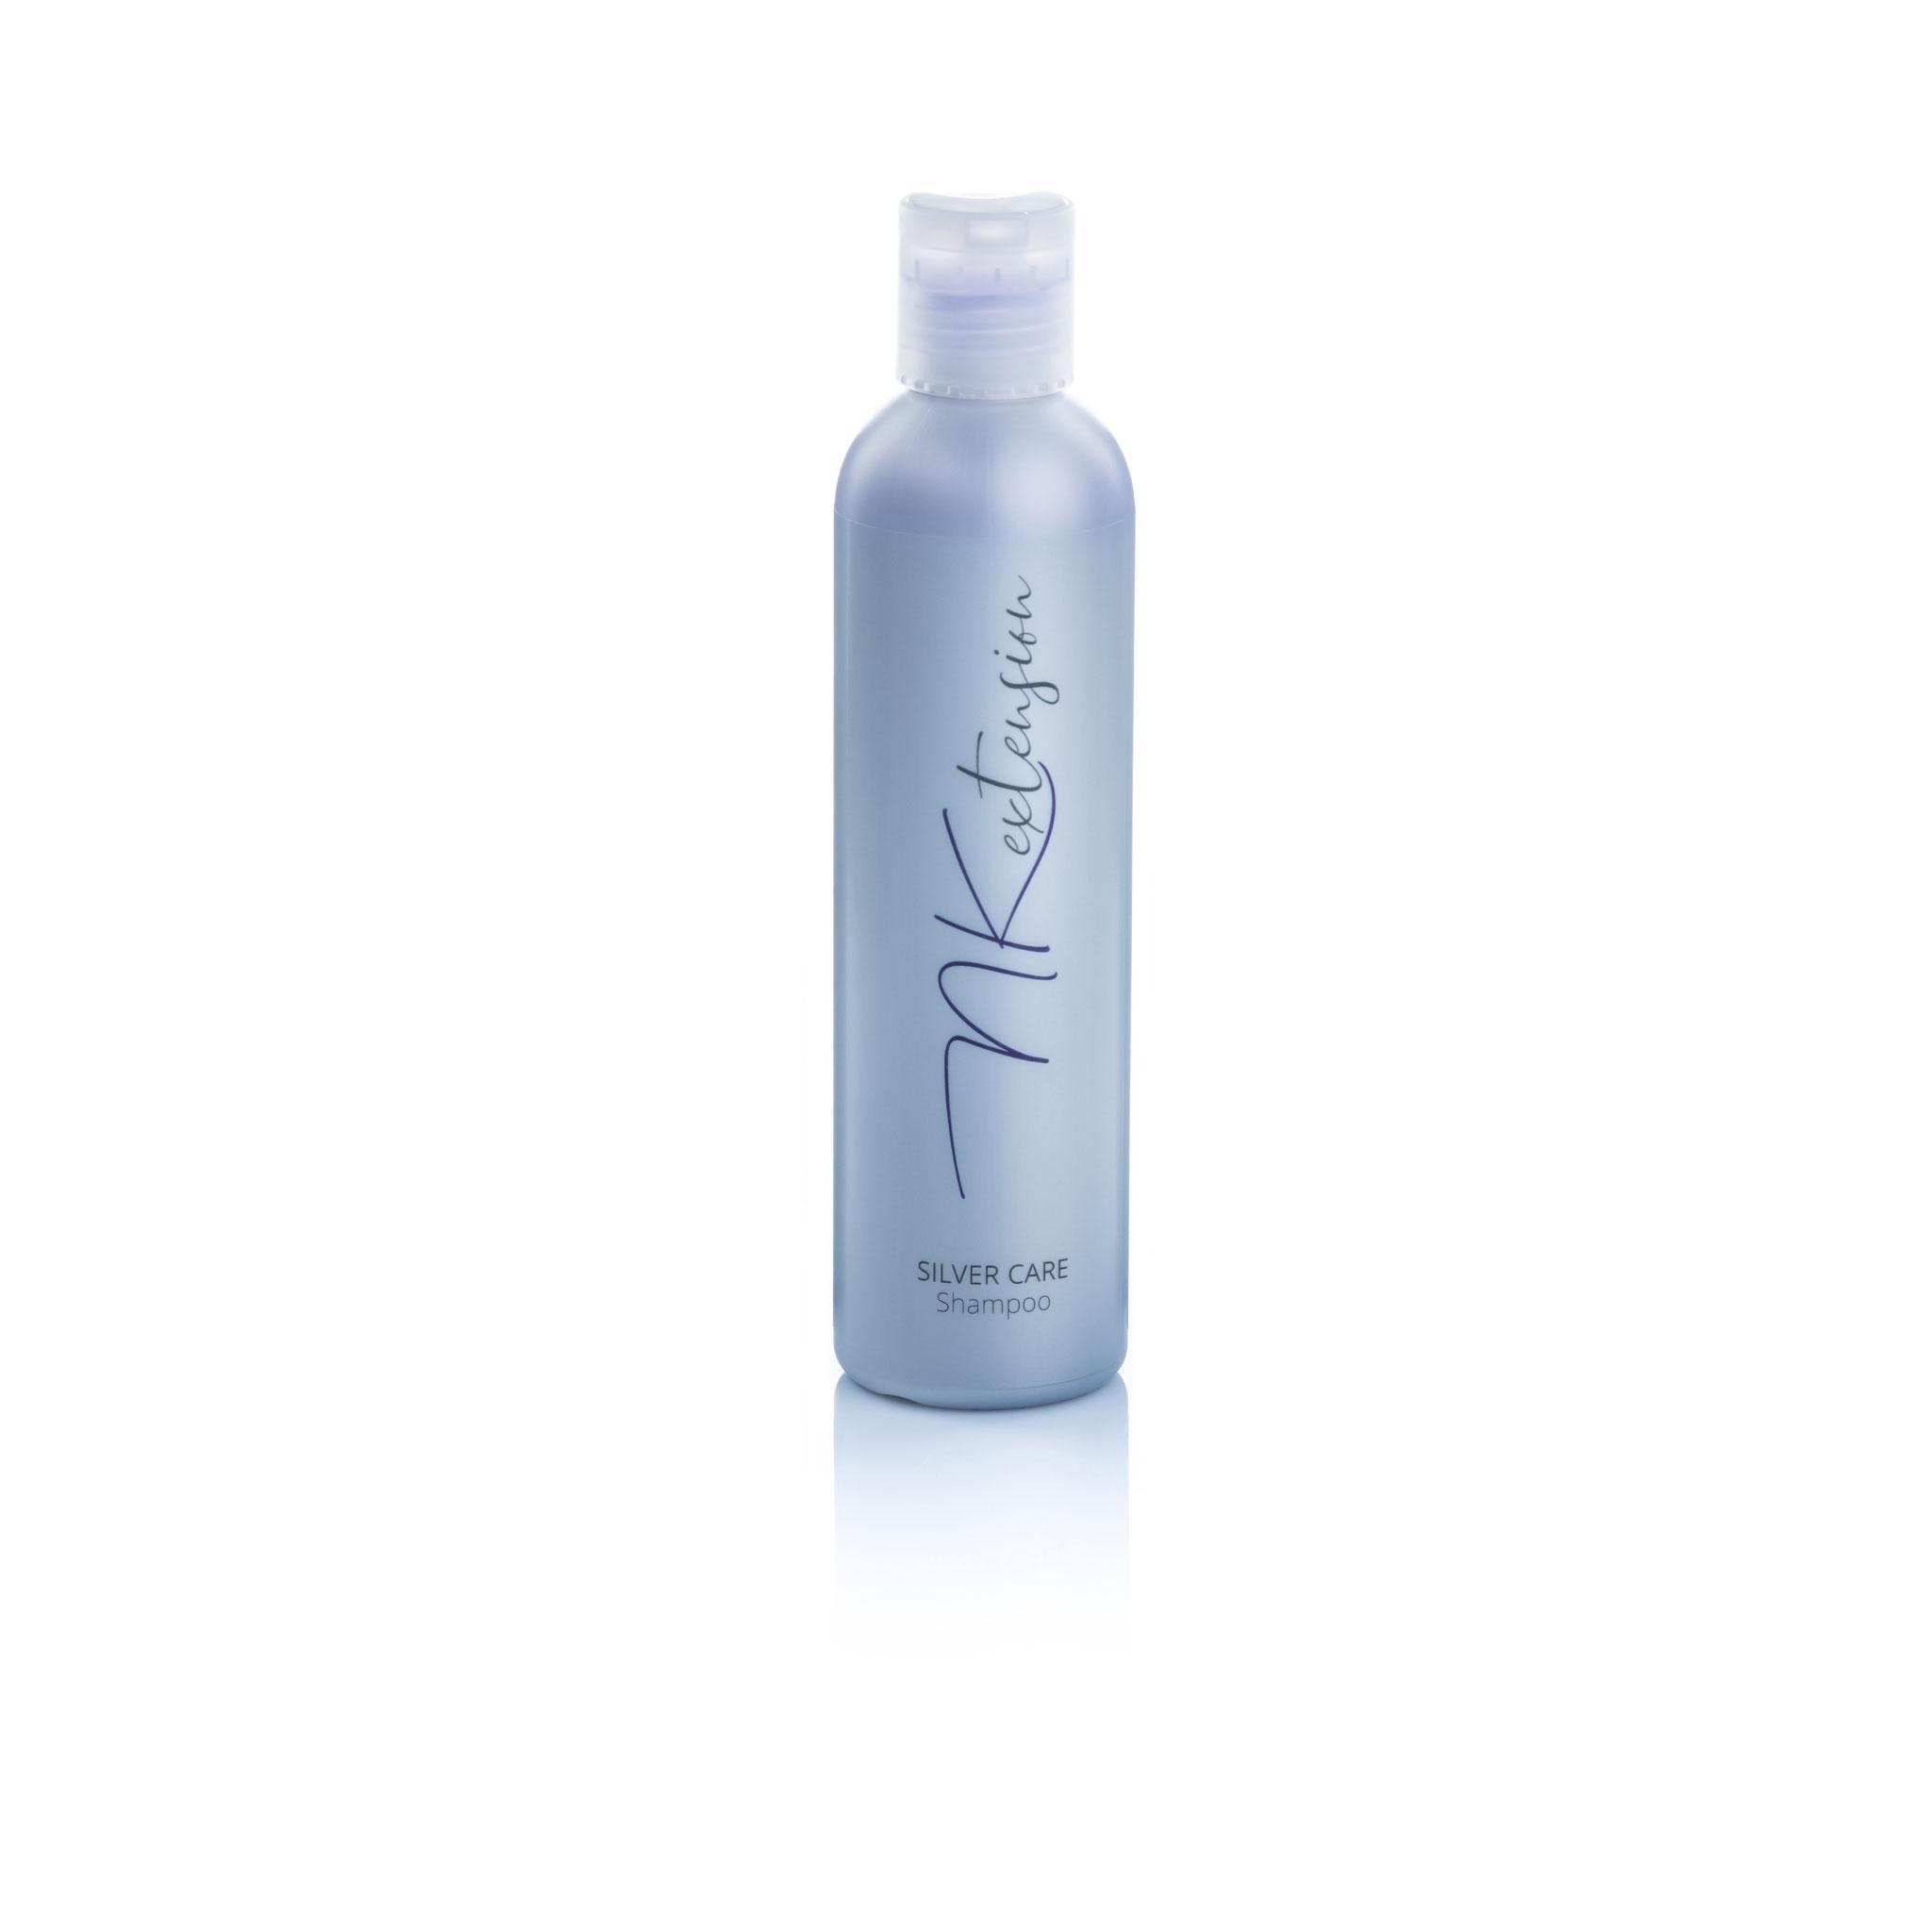 Silver Care Shampoo 200ml